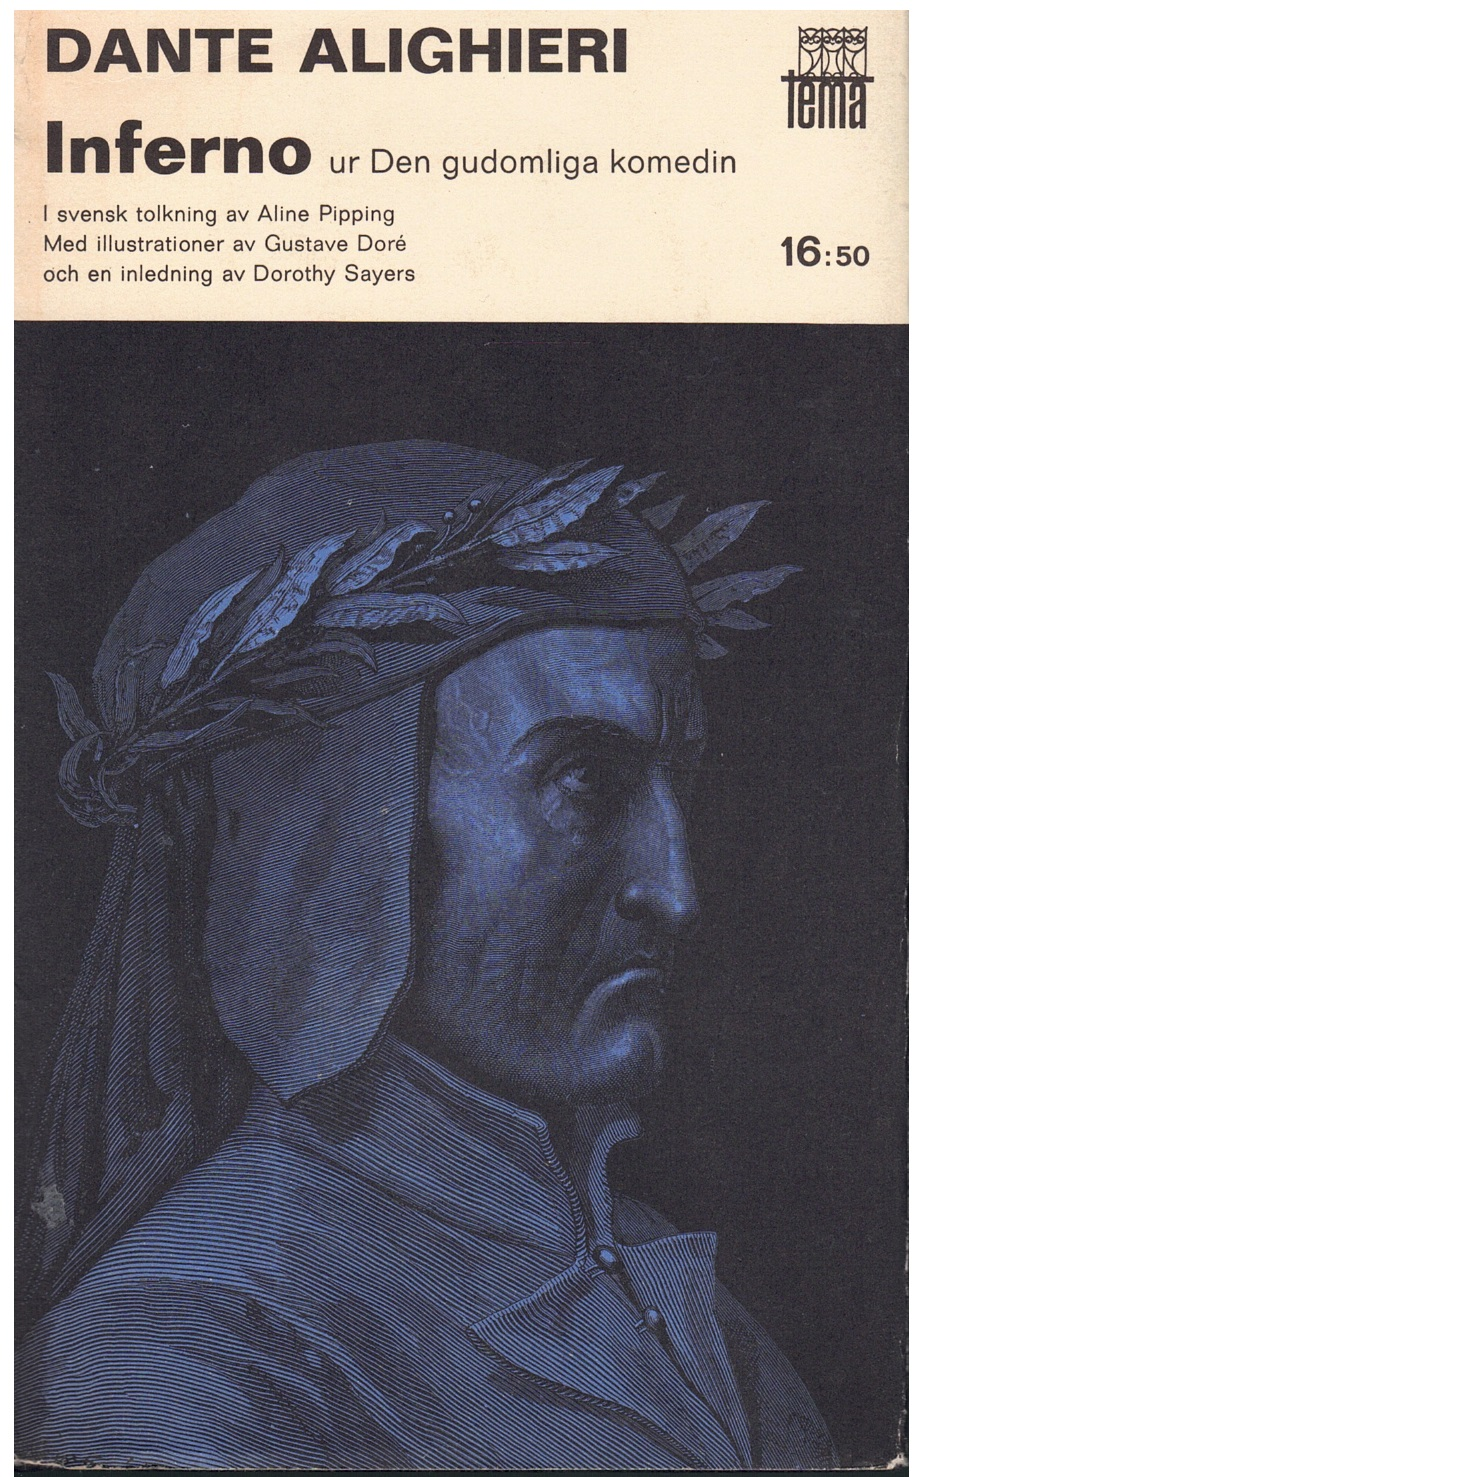 Den gudomliga komedin Inferno - Dante Alighieri